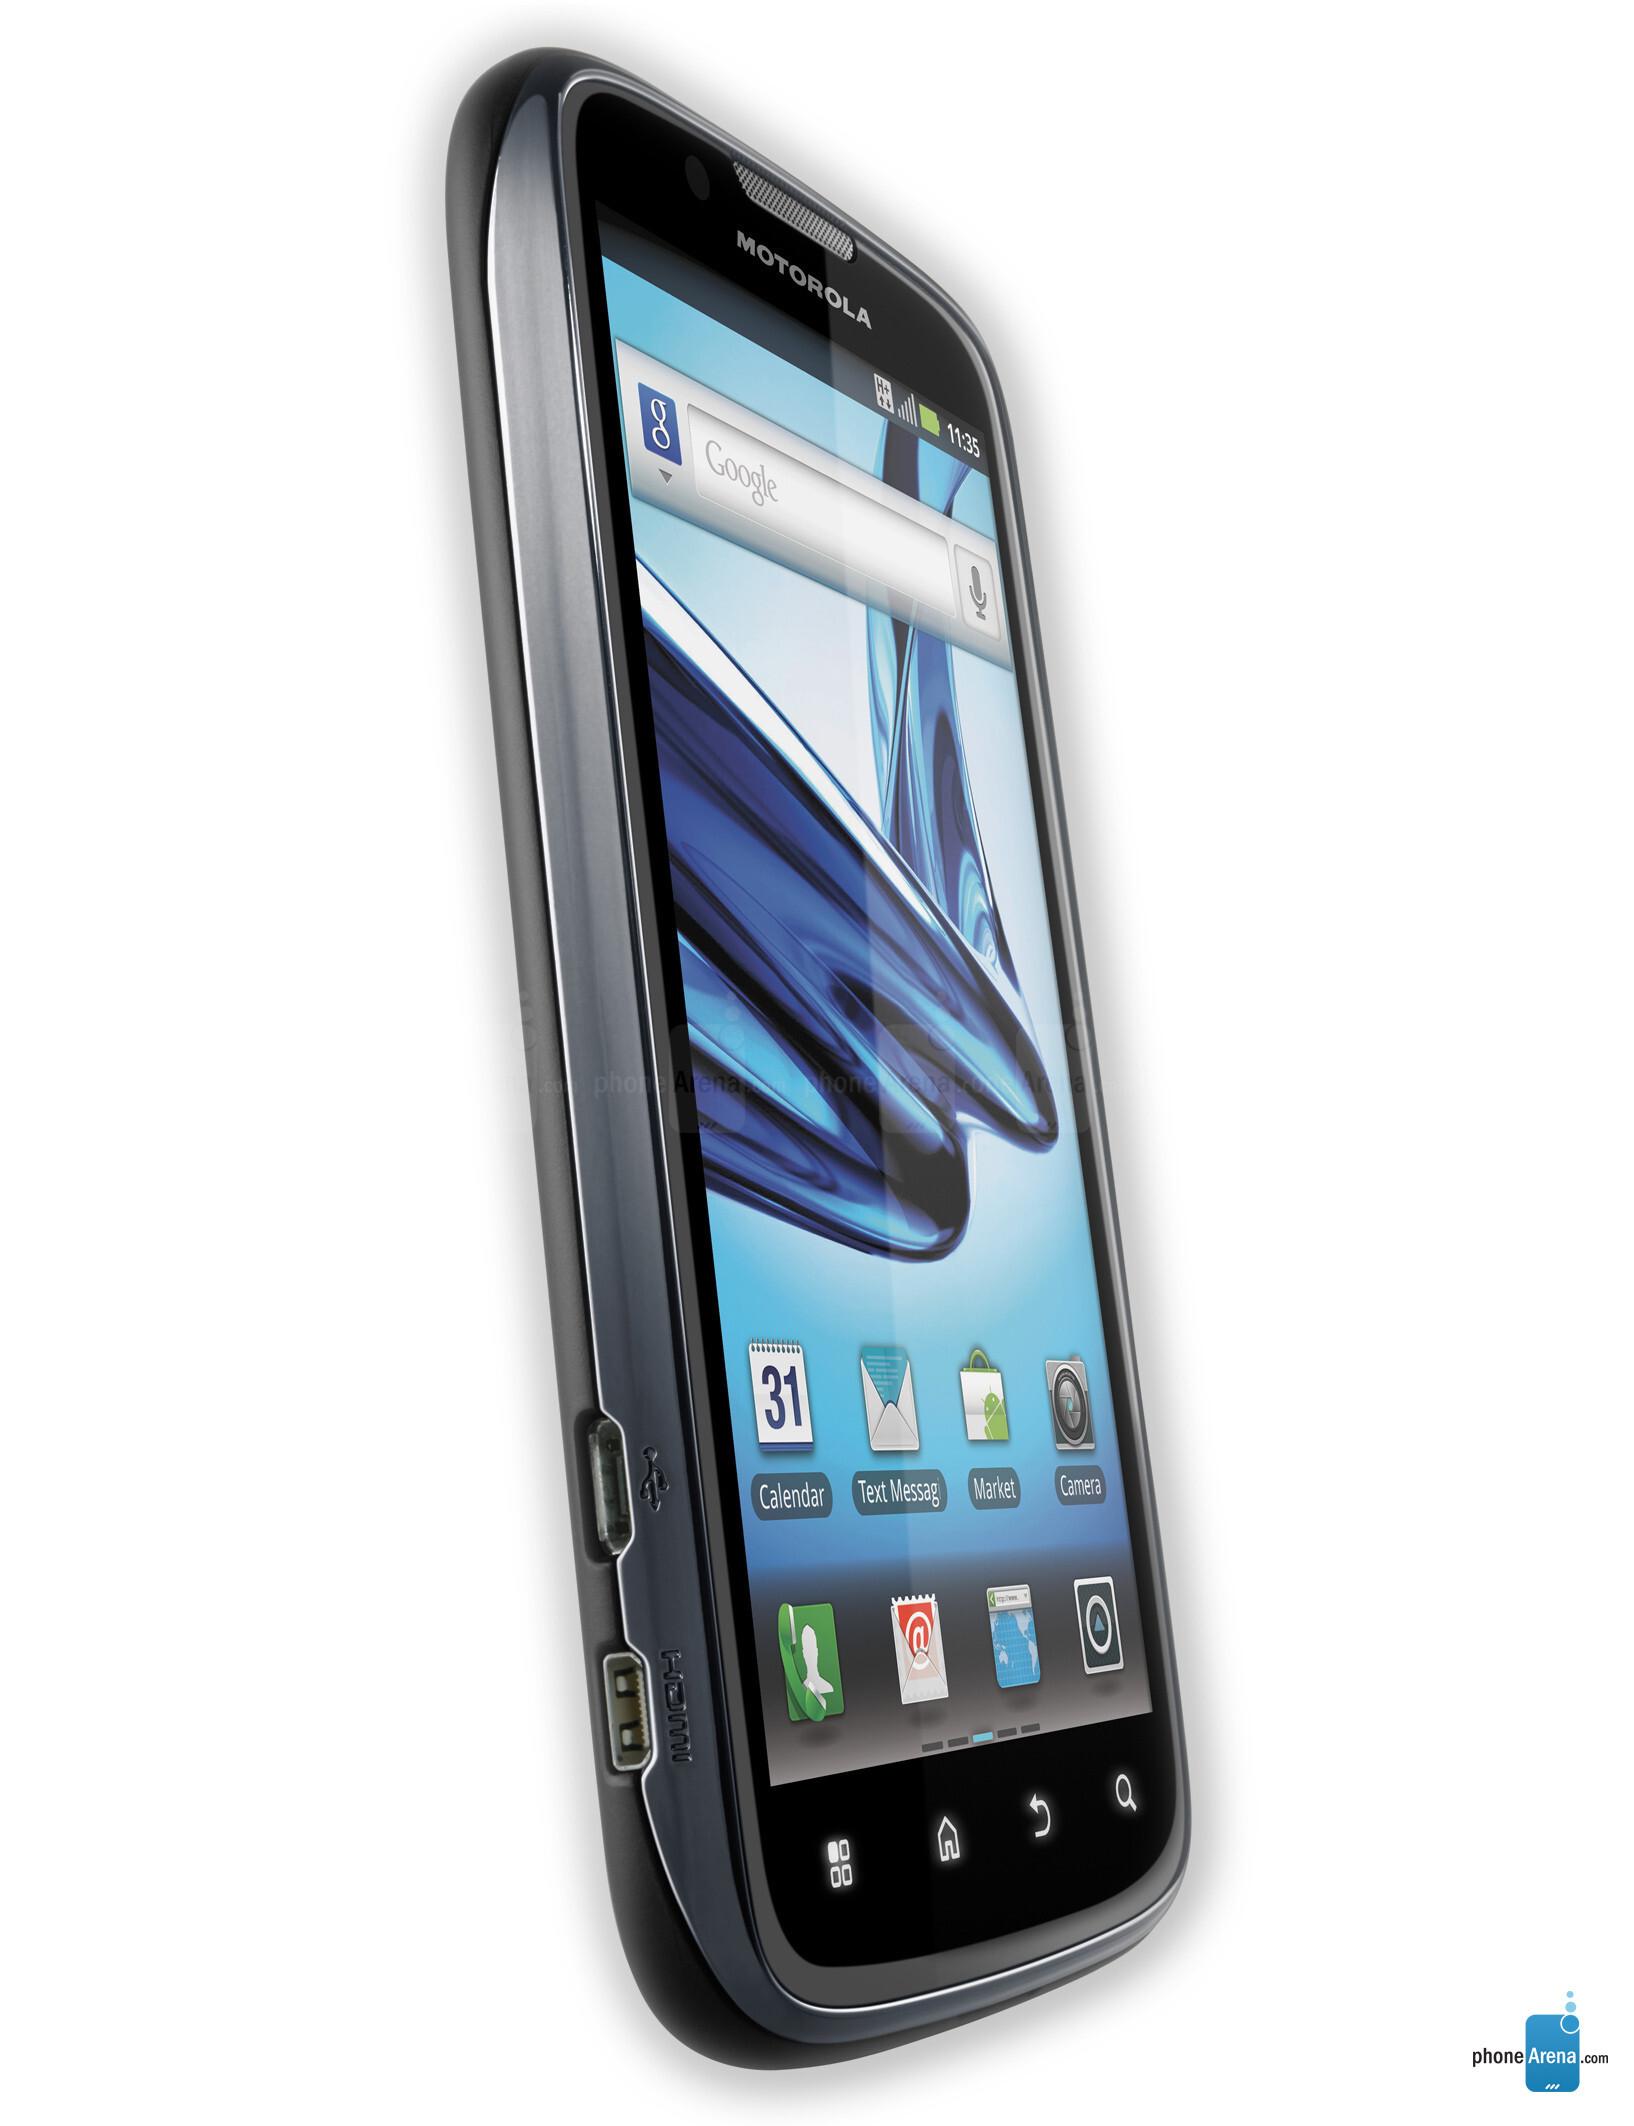 Motorola ATRIX 2 specs